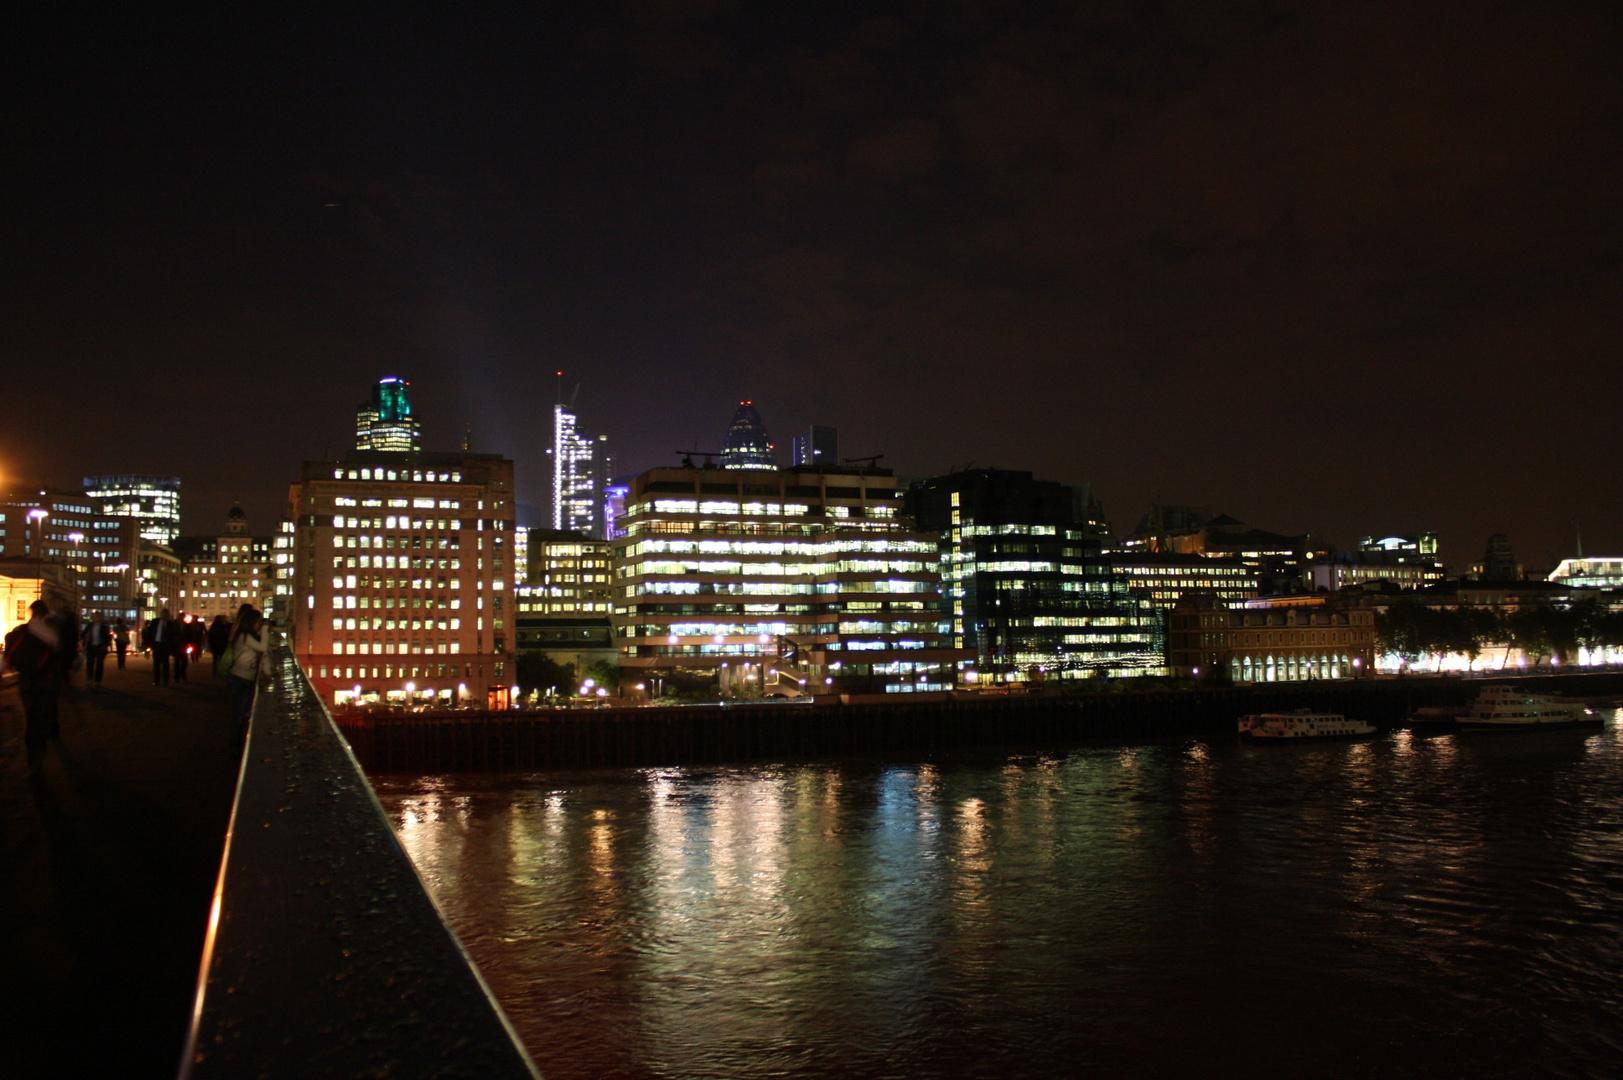 London Bridge - Small Skyline